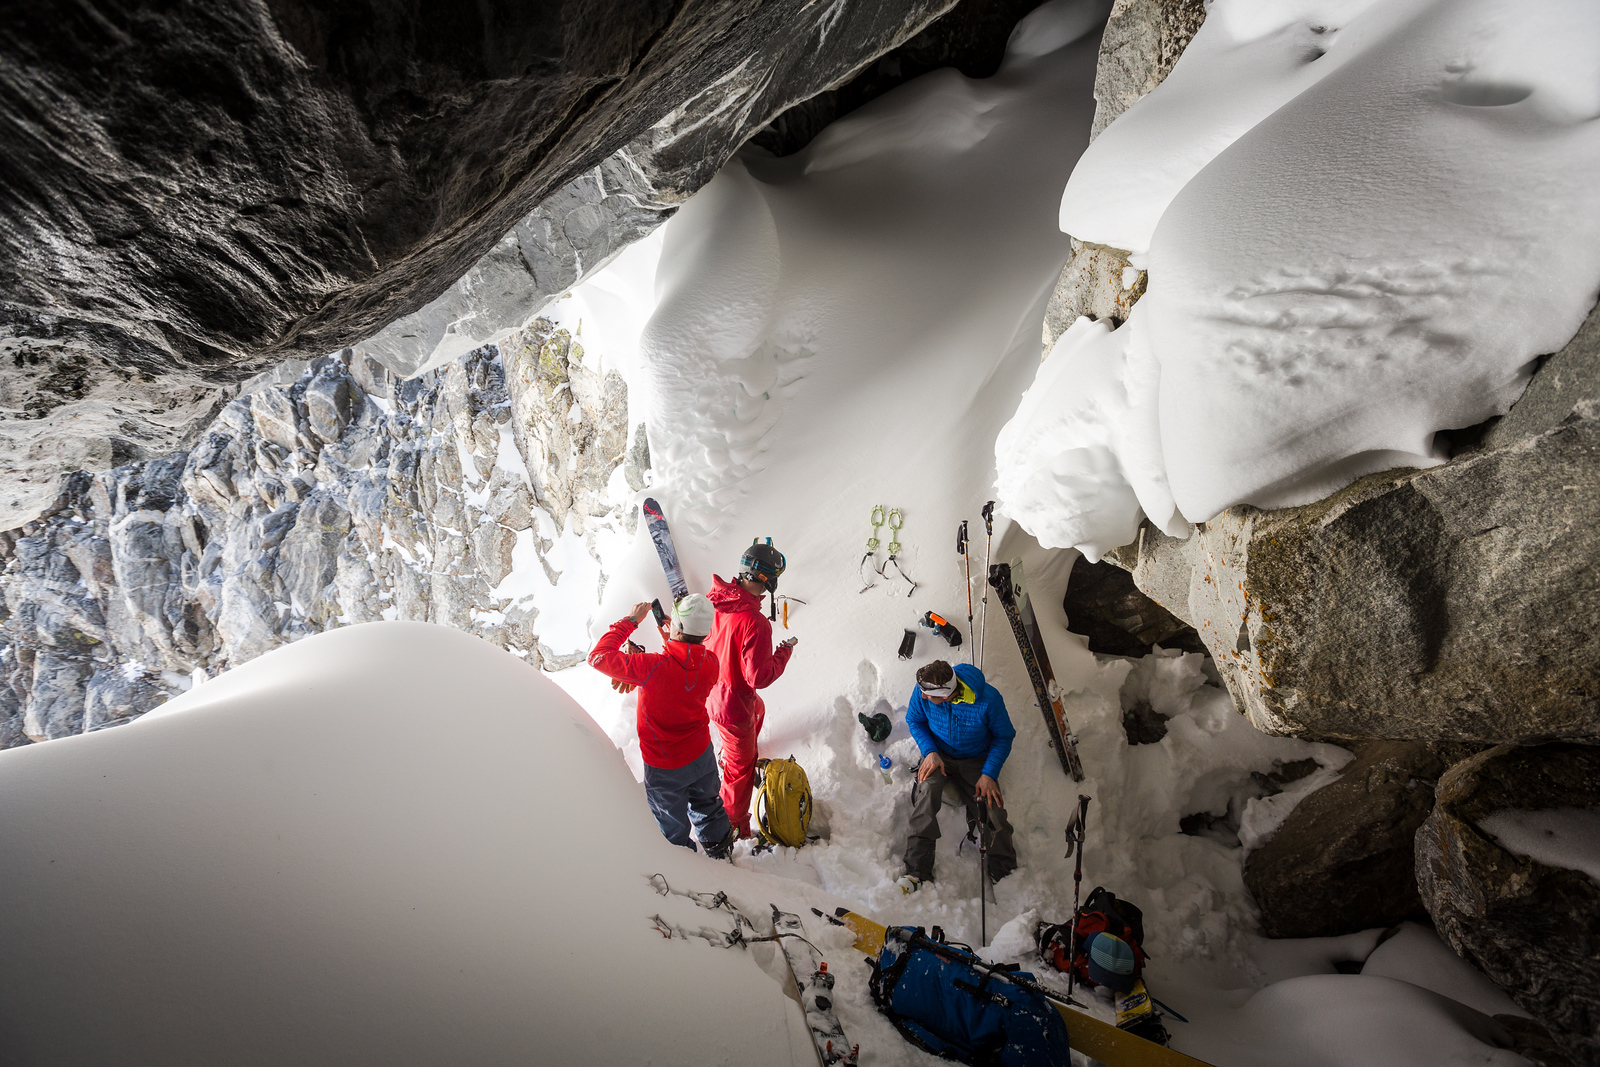 Mt Wisters secret cave of wonders